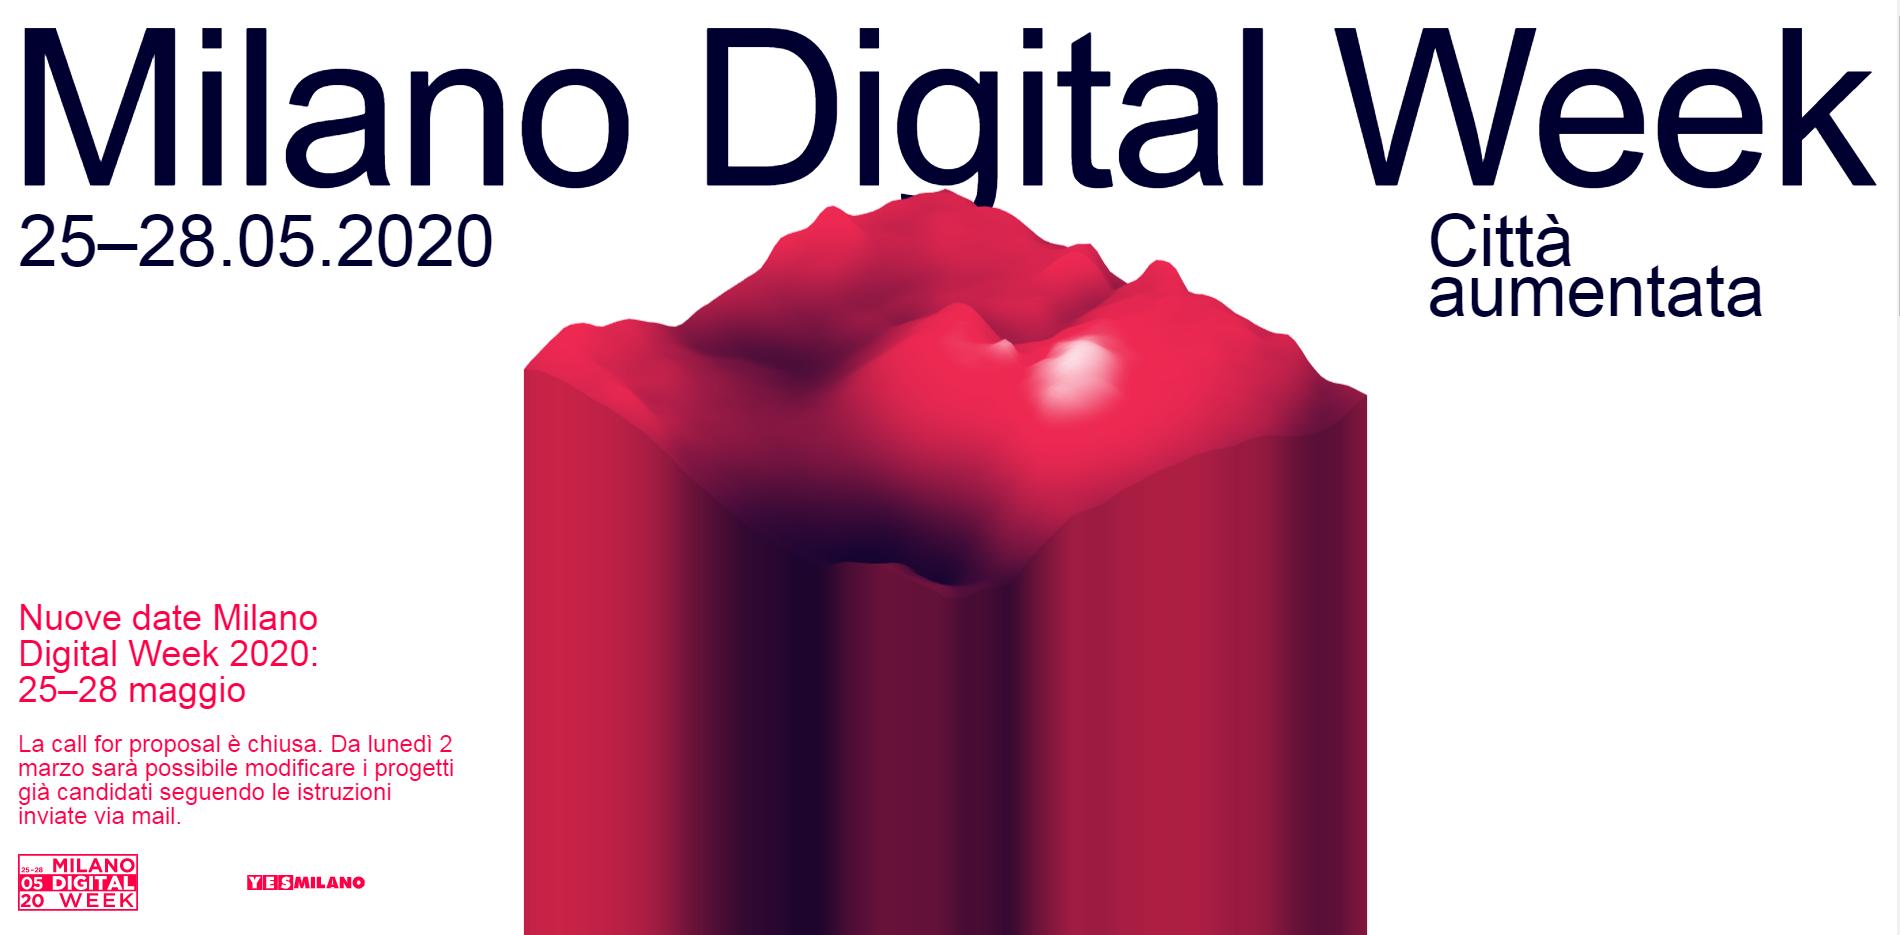 Evento Digitale